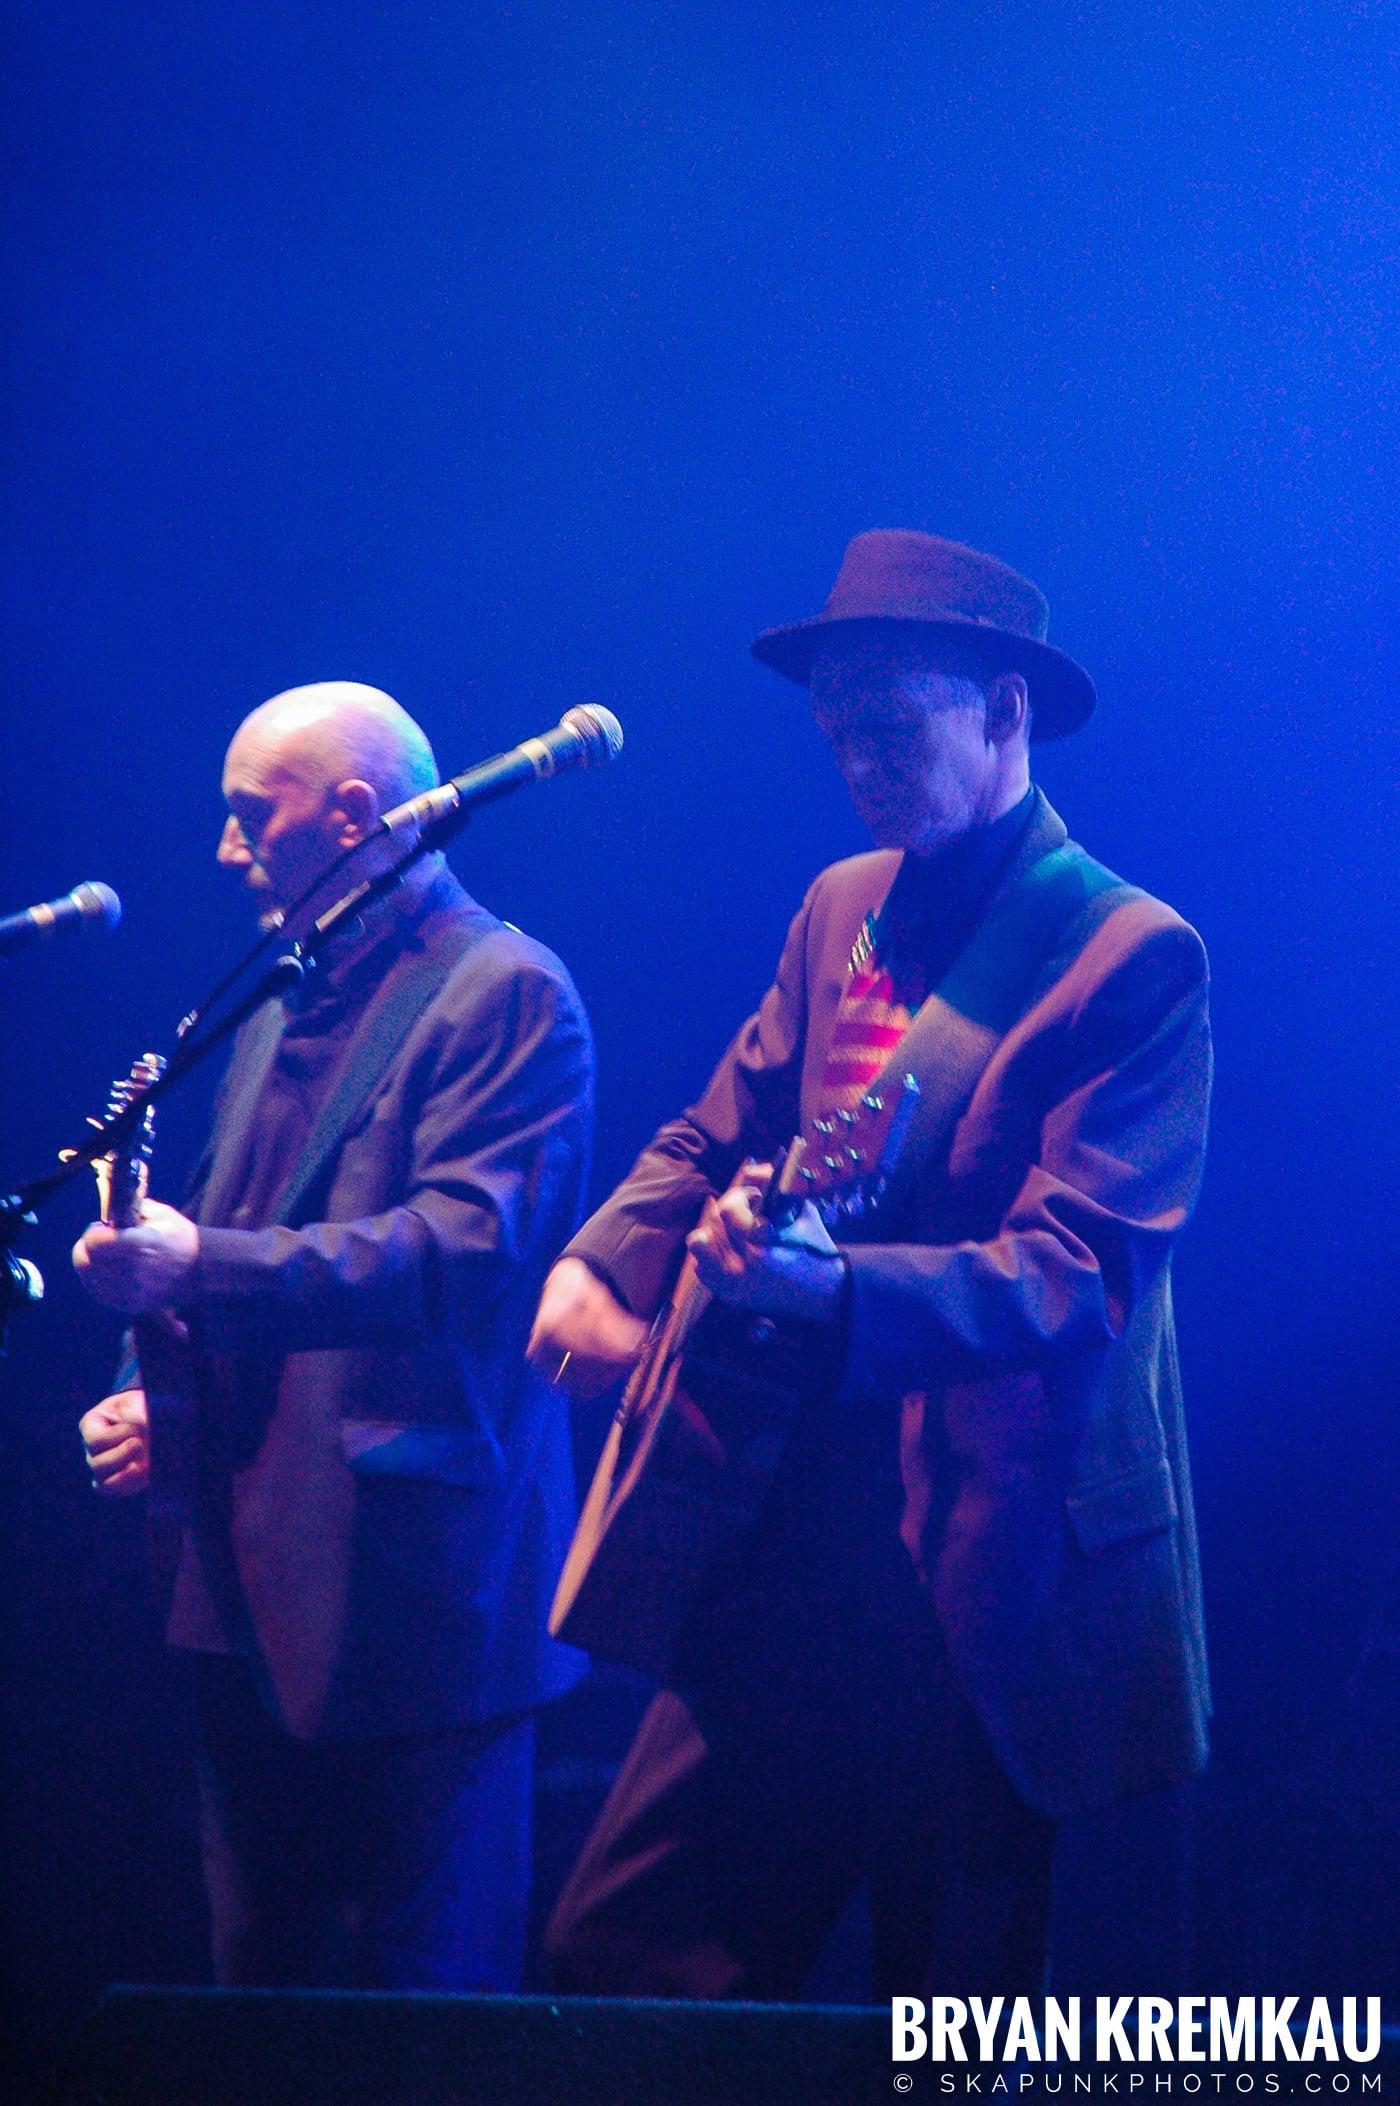 The Pogues @ Brixton Academy, London UK - 12.19.05 (28)